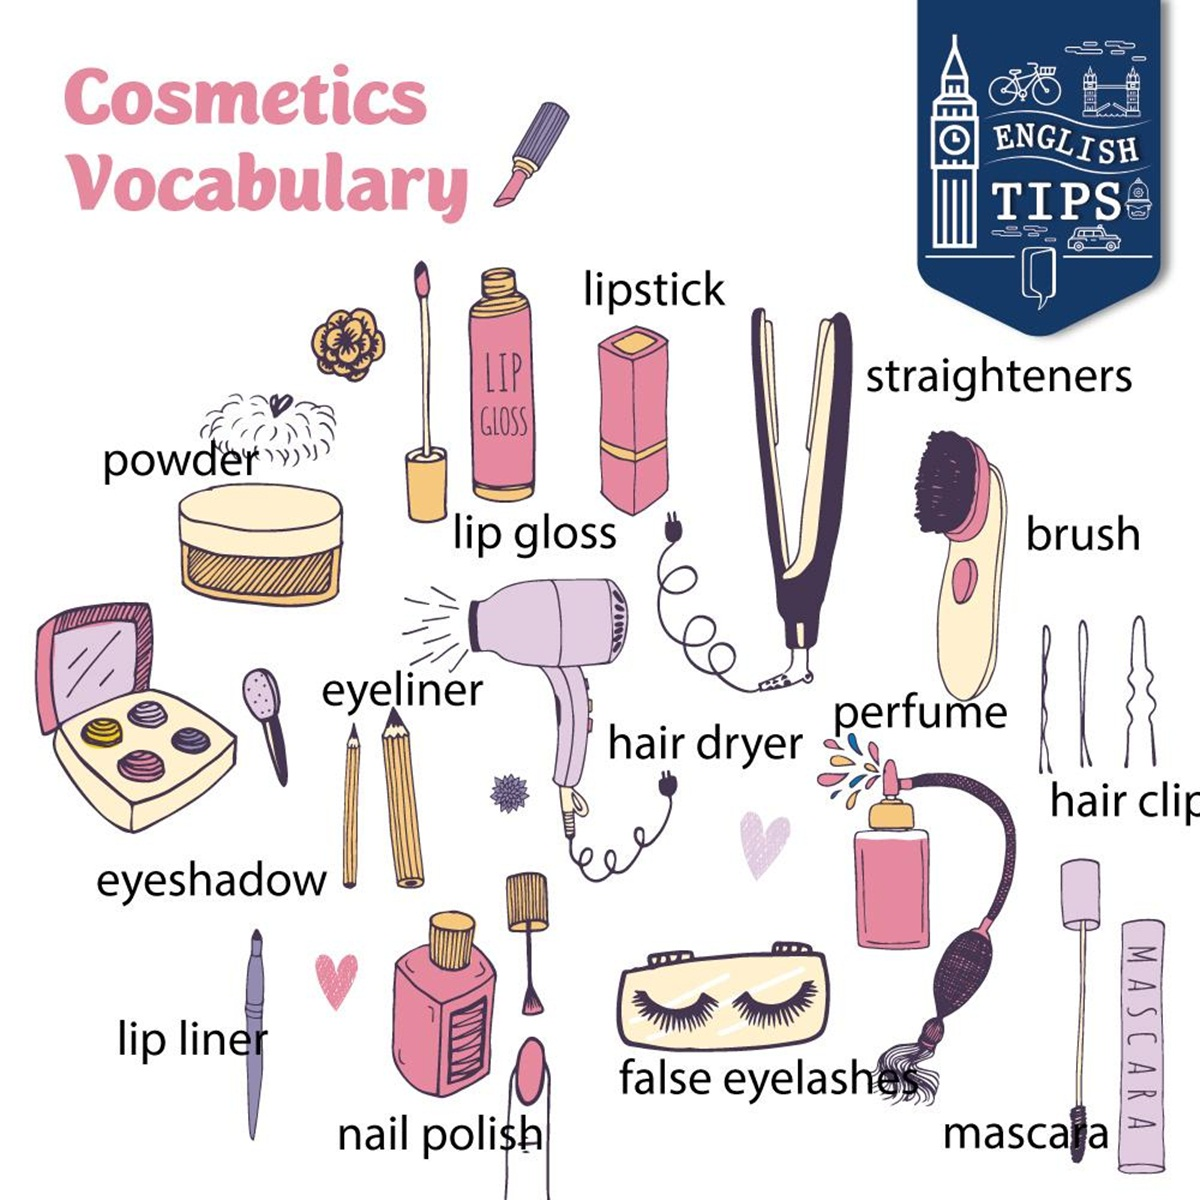 Vocabulary Cosmetics Amp Make Up